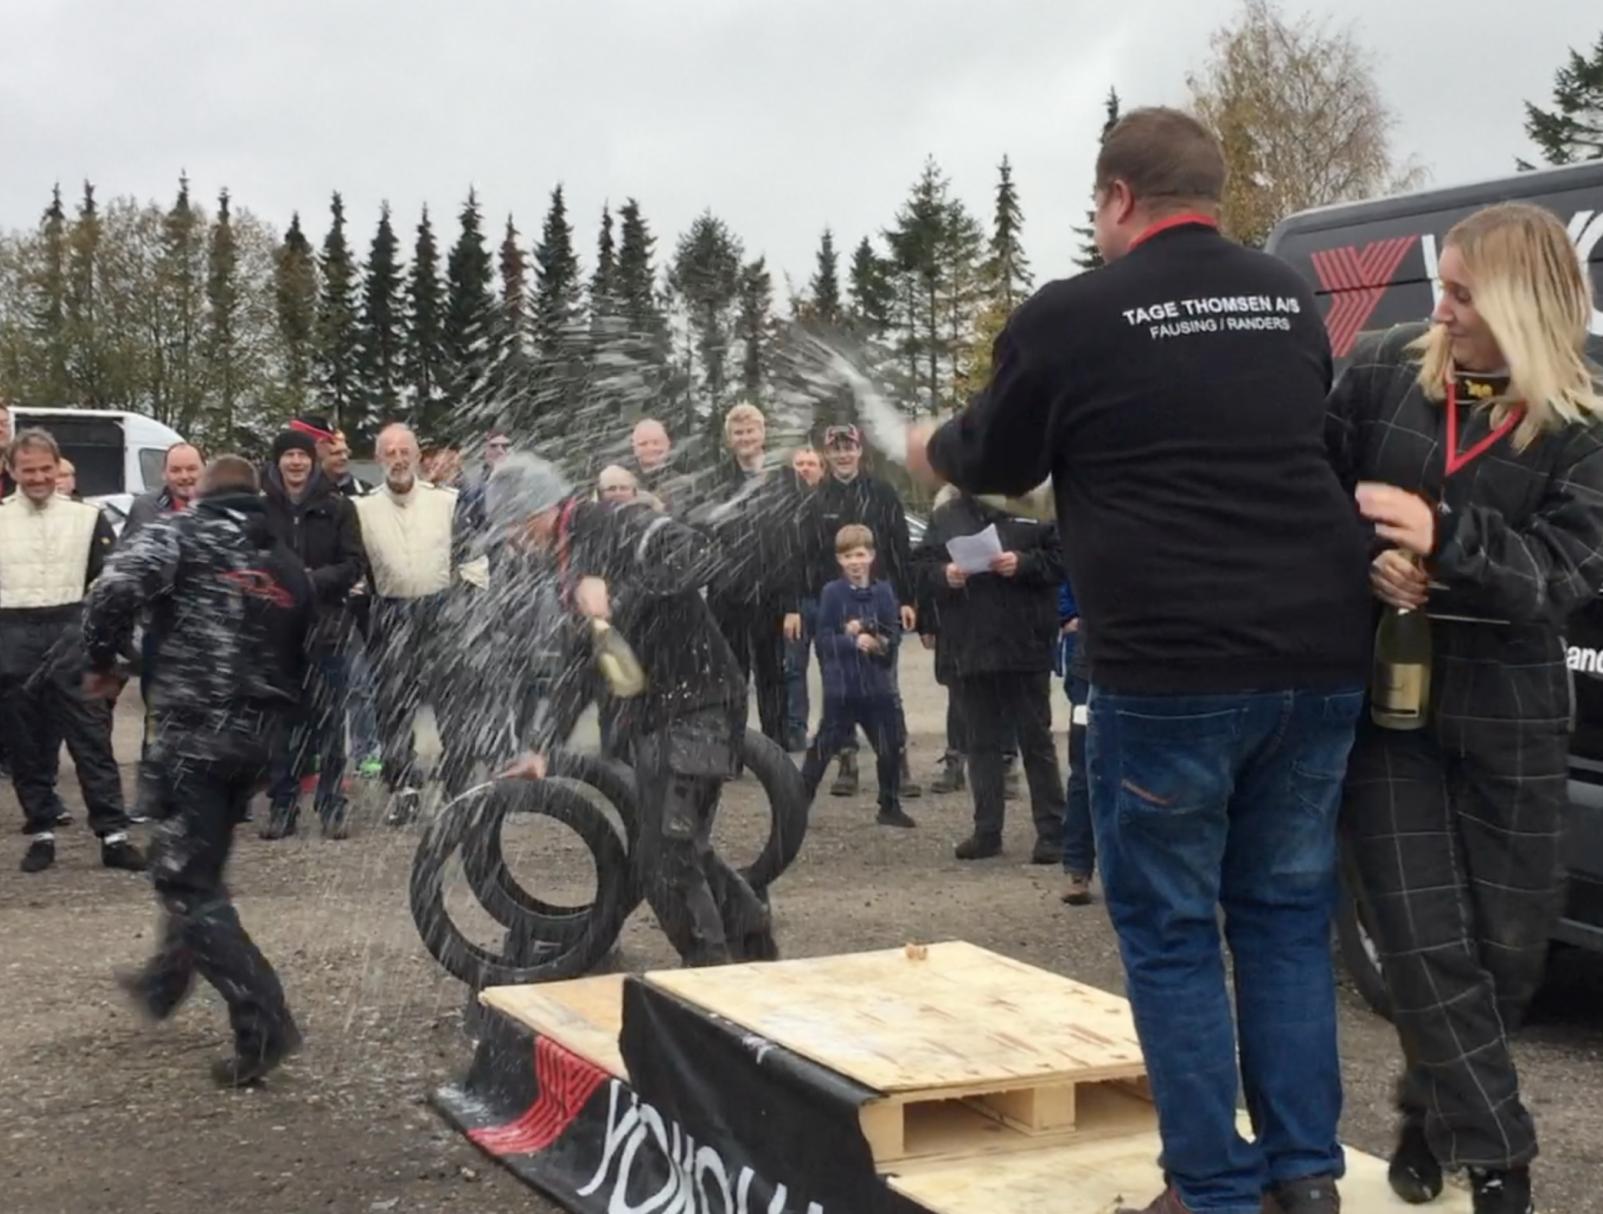 SE VIDEO: RALLYSPRINT BLEV KØRT I ERRITSØ